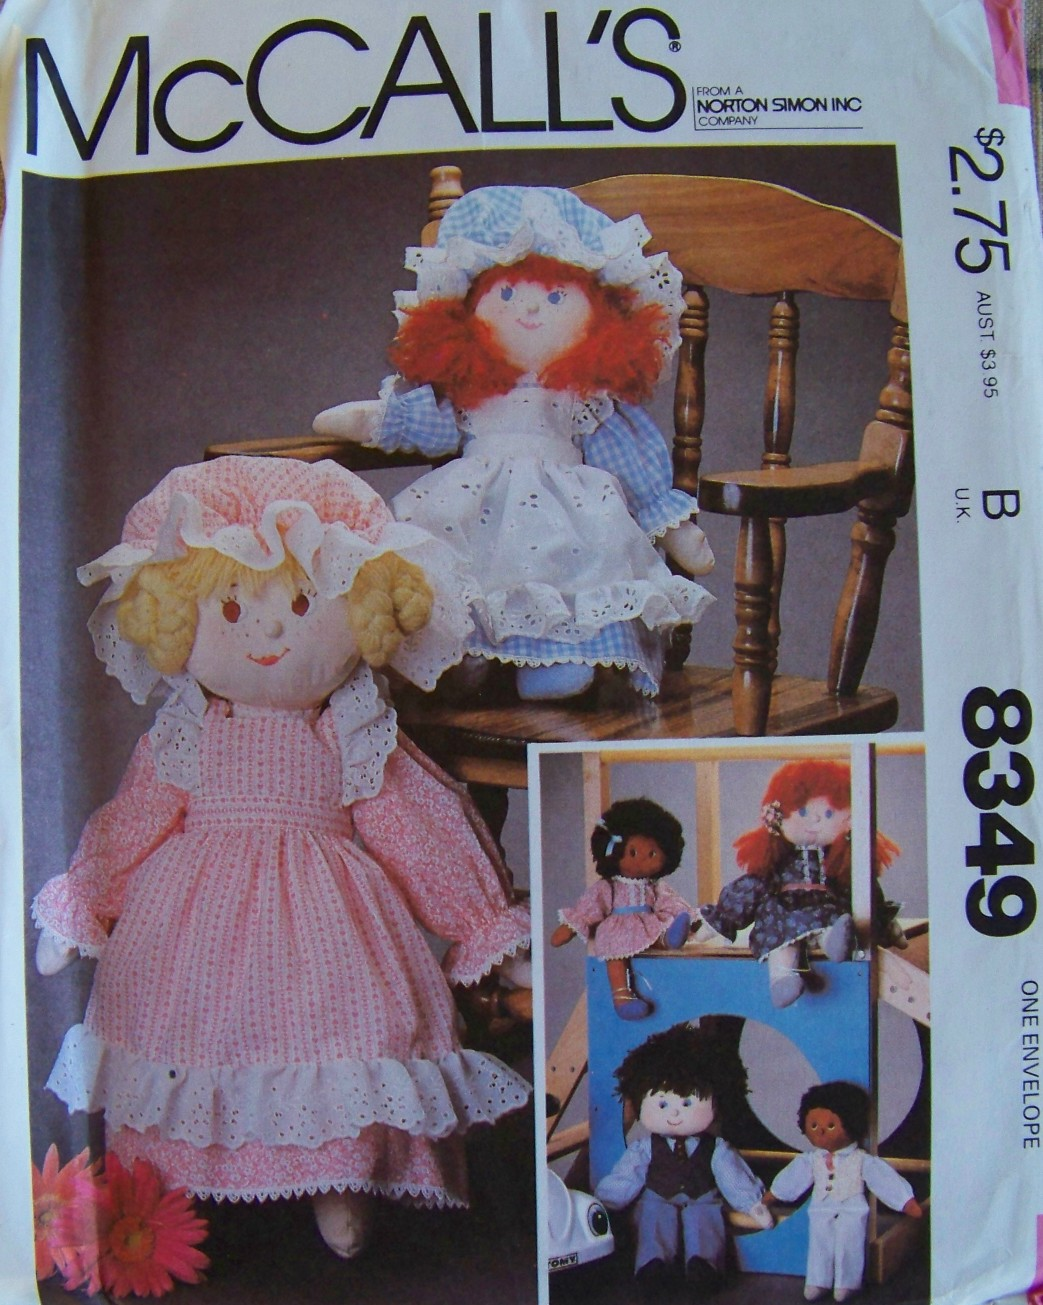 image regarding Printable Rag Doll Patterns named McCalls 8349 A Classic Sewing Behaviors FANDOM run